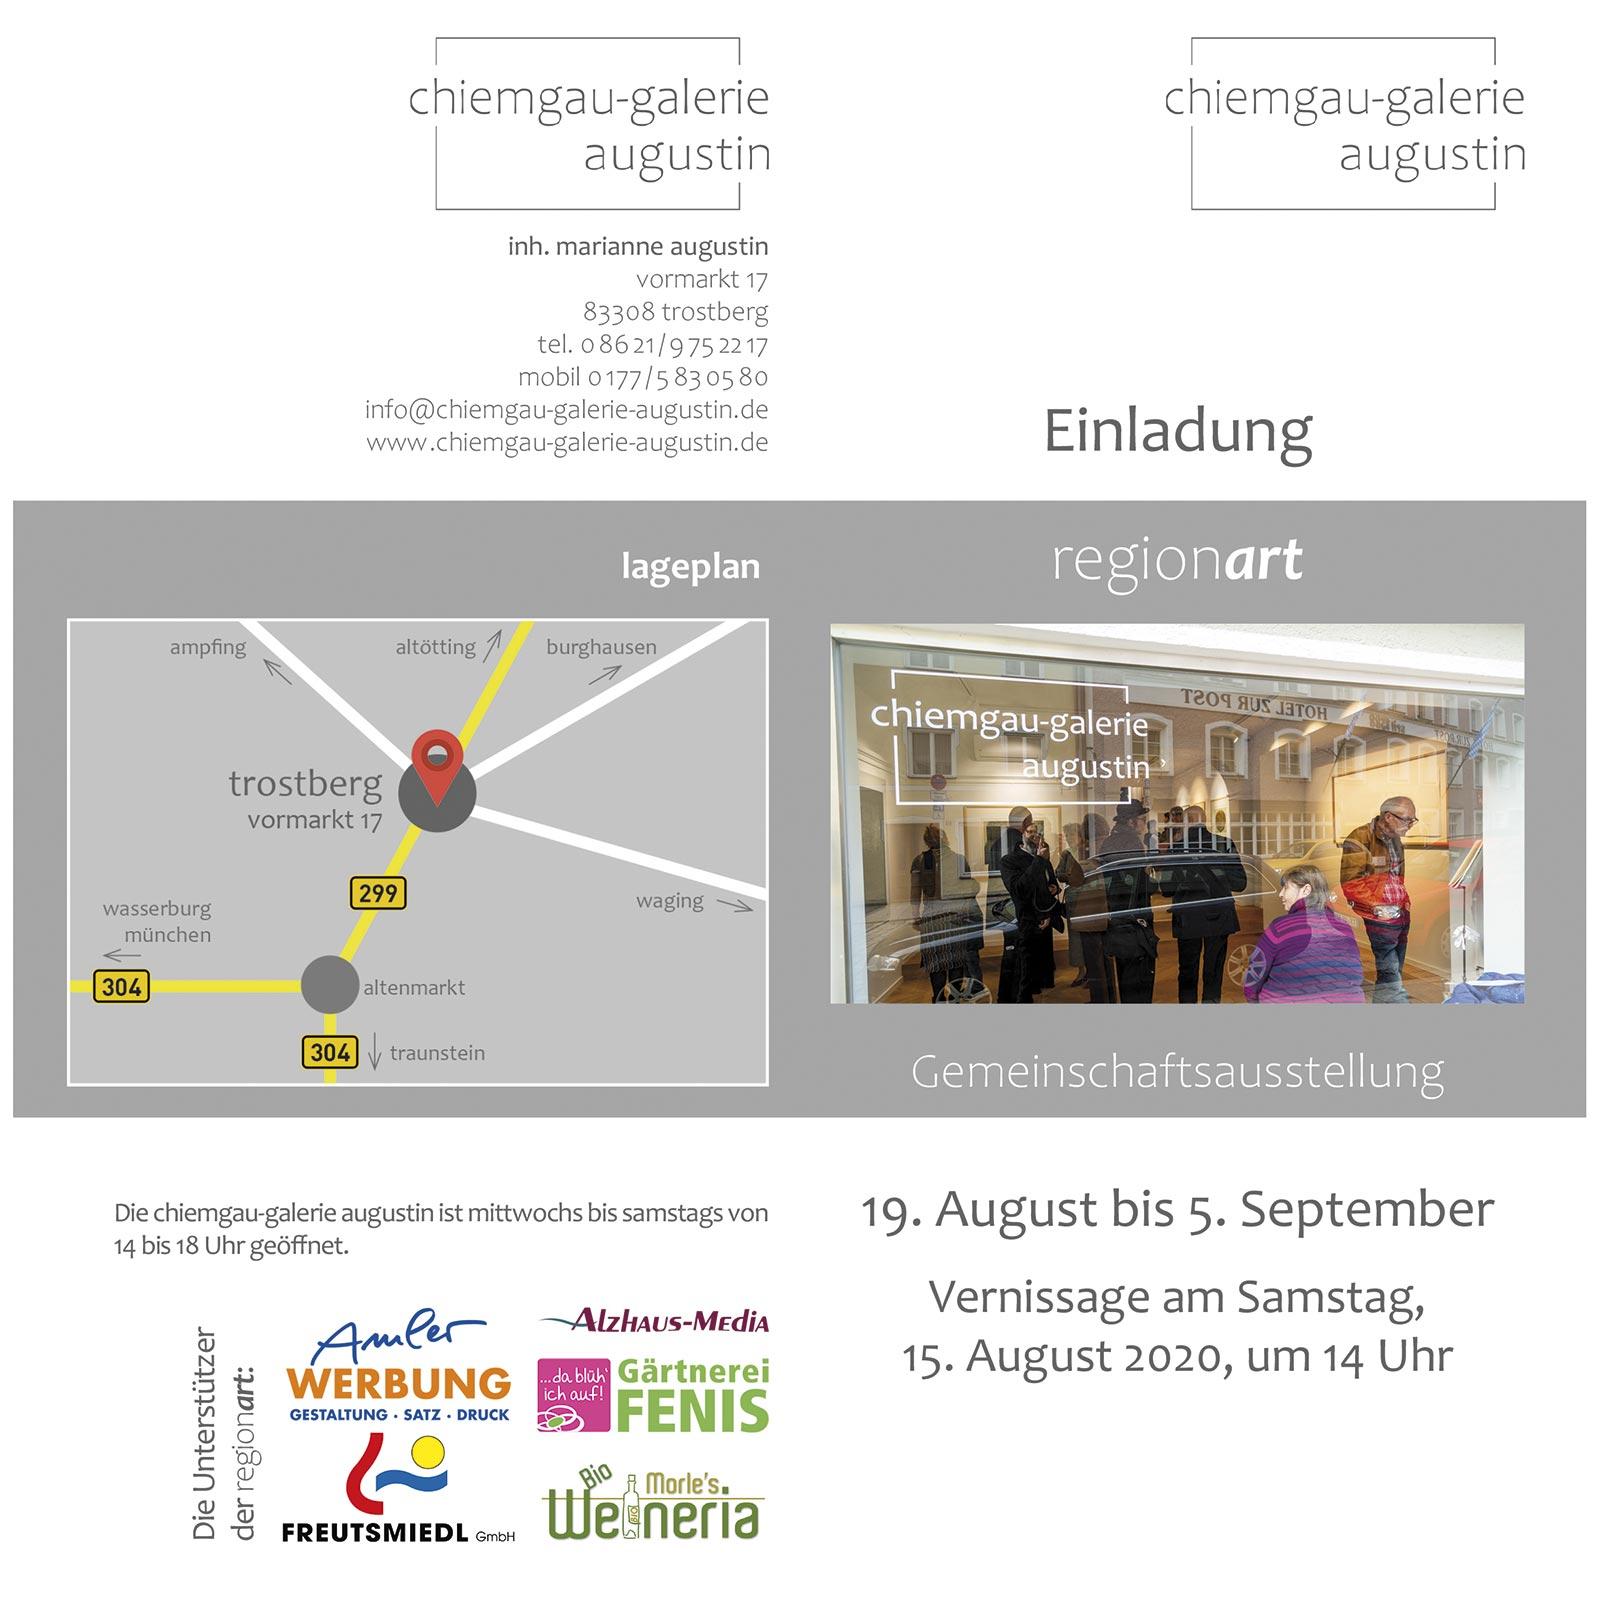 chiemgau-galerie augustin | Gruppenausstellung | Barbara Back